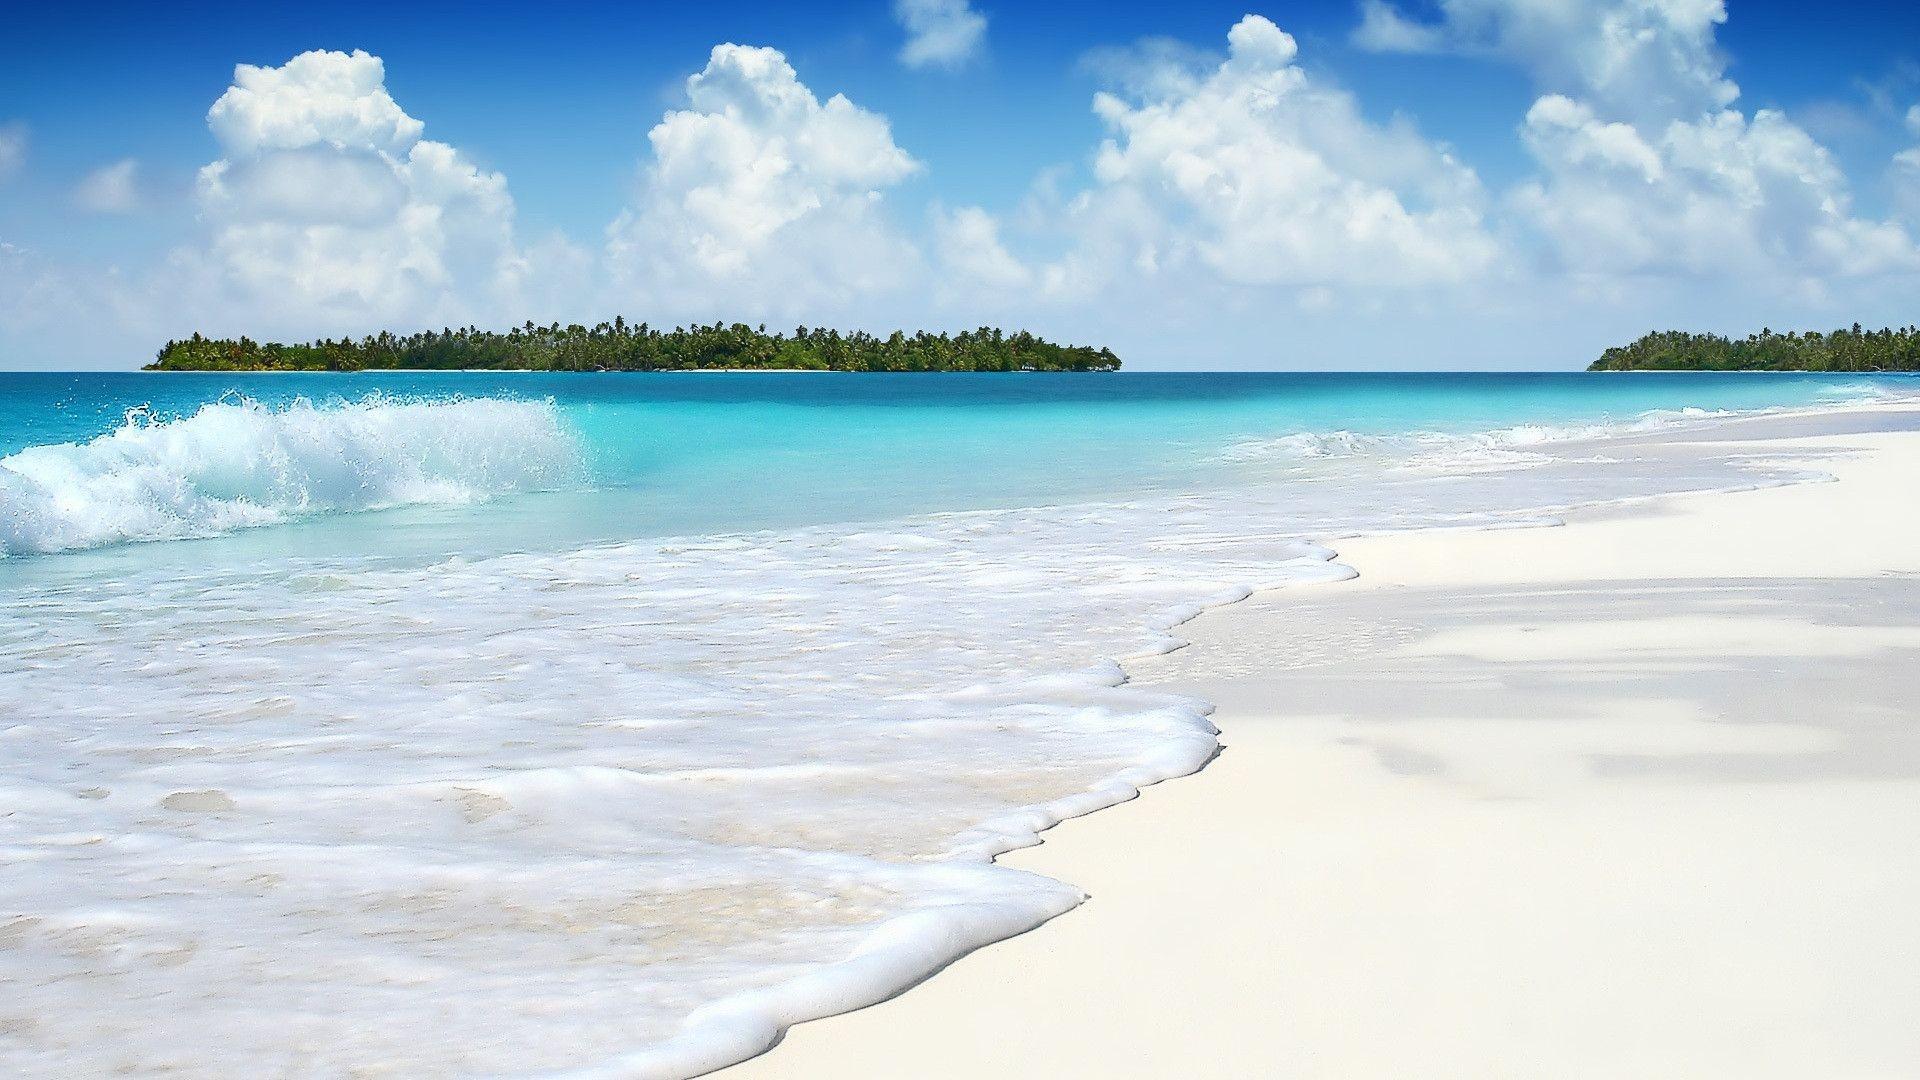 beach wallpaper hd ·① download free cool hd backgrounds for desktop